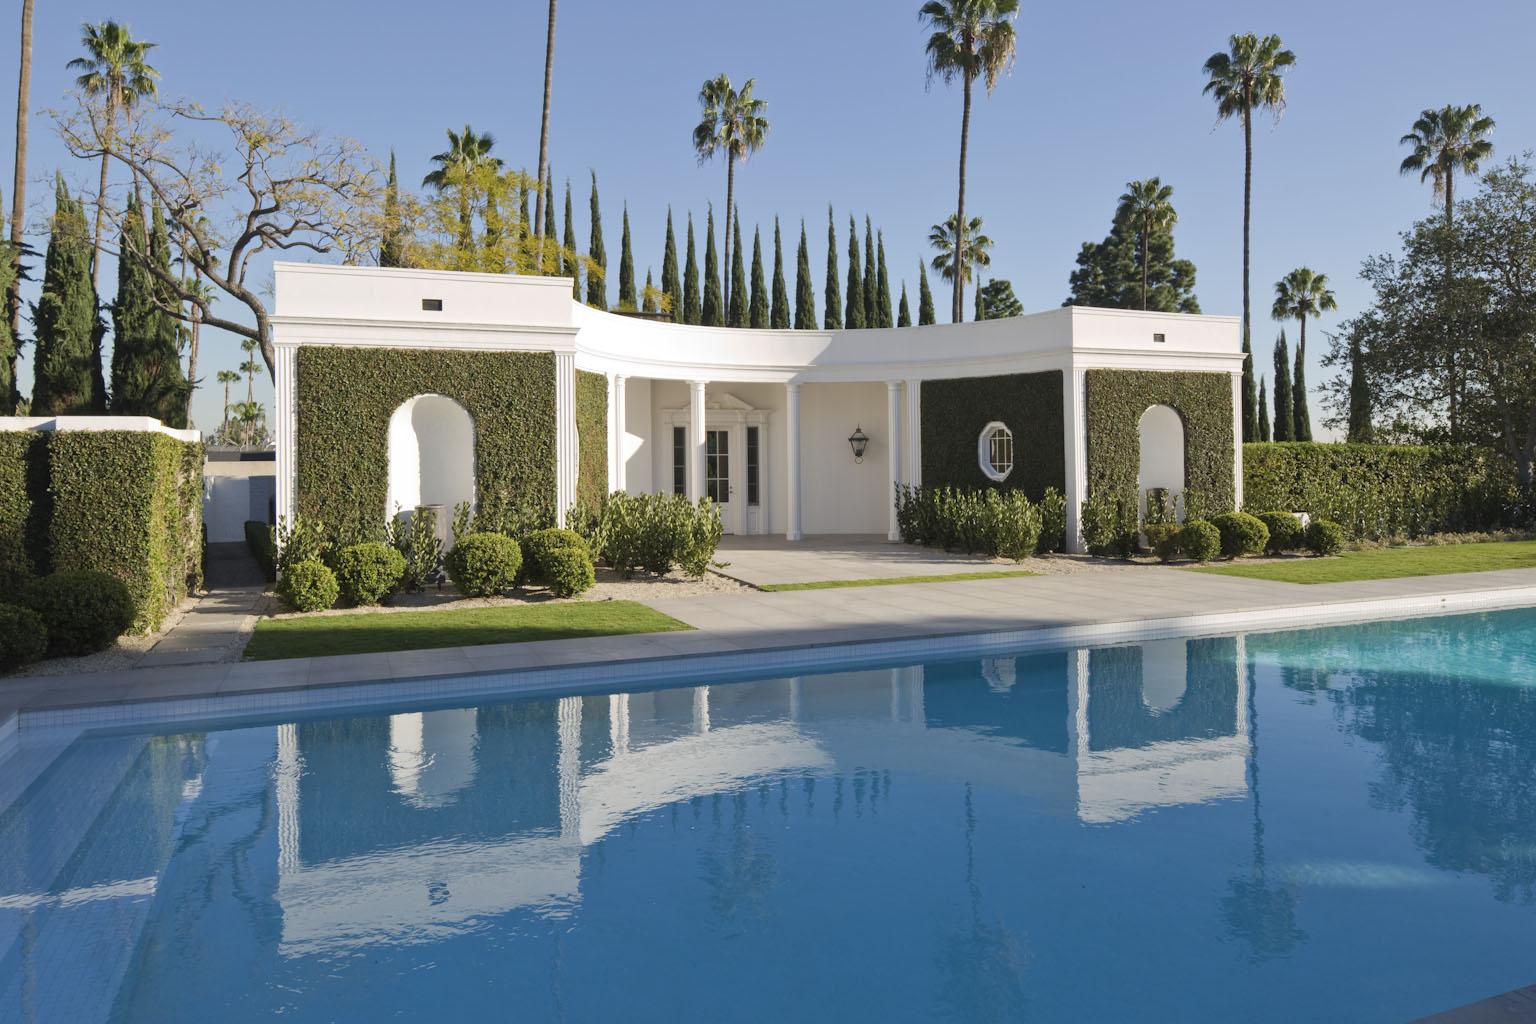 Hillcrest Pool house